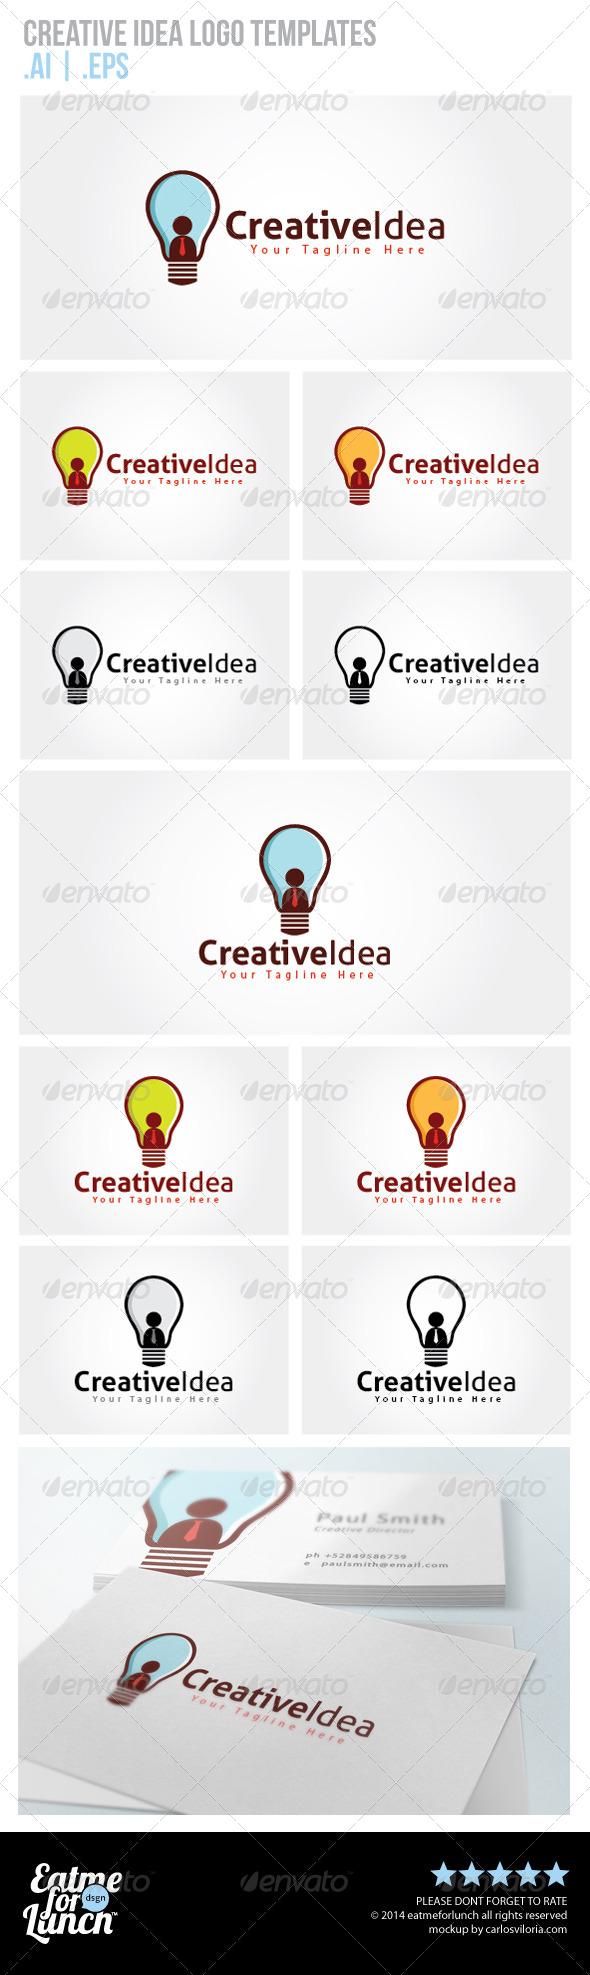 GraphicRiver Creative Idea Logo Templates 6657821